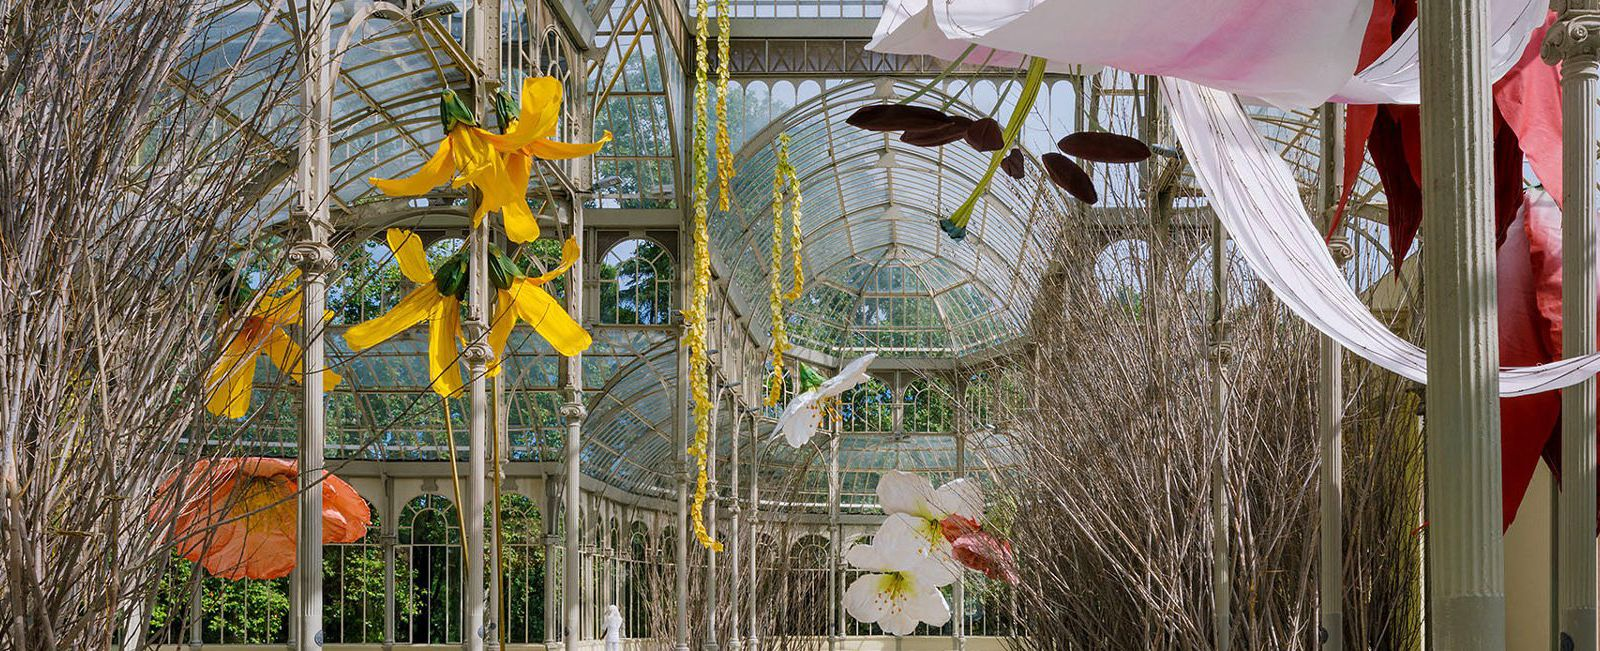 Petrit Halilaj: Τεράστια λουλούδια και φωλιές πουλιών σε διάλογο με το πάρκο της πόλης της Μαδρίτης